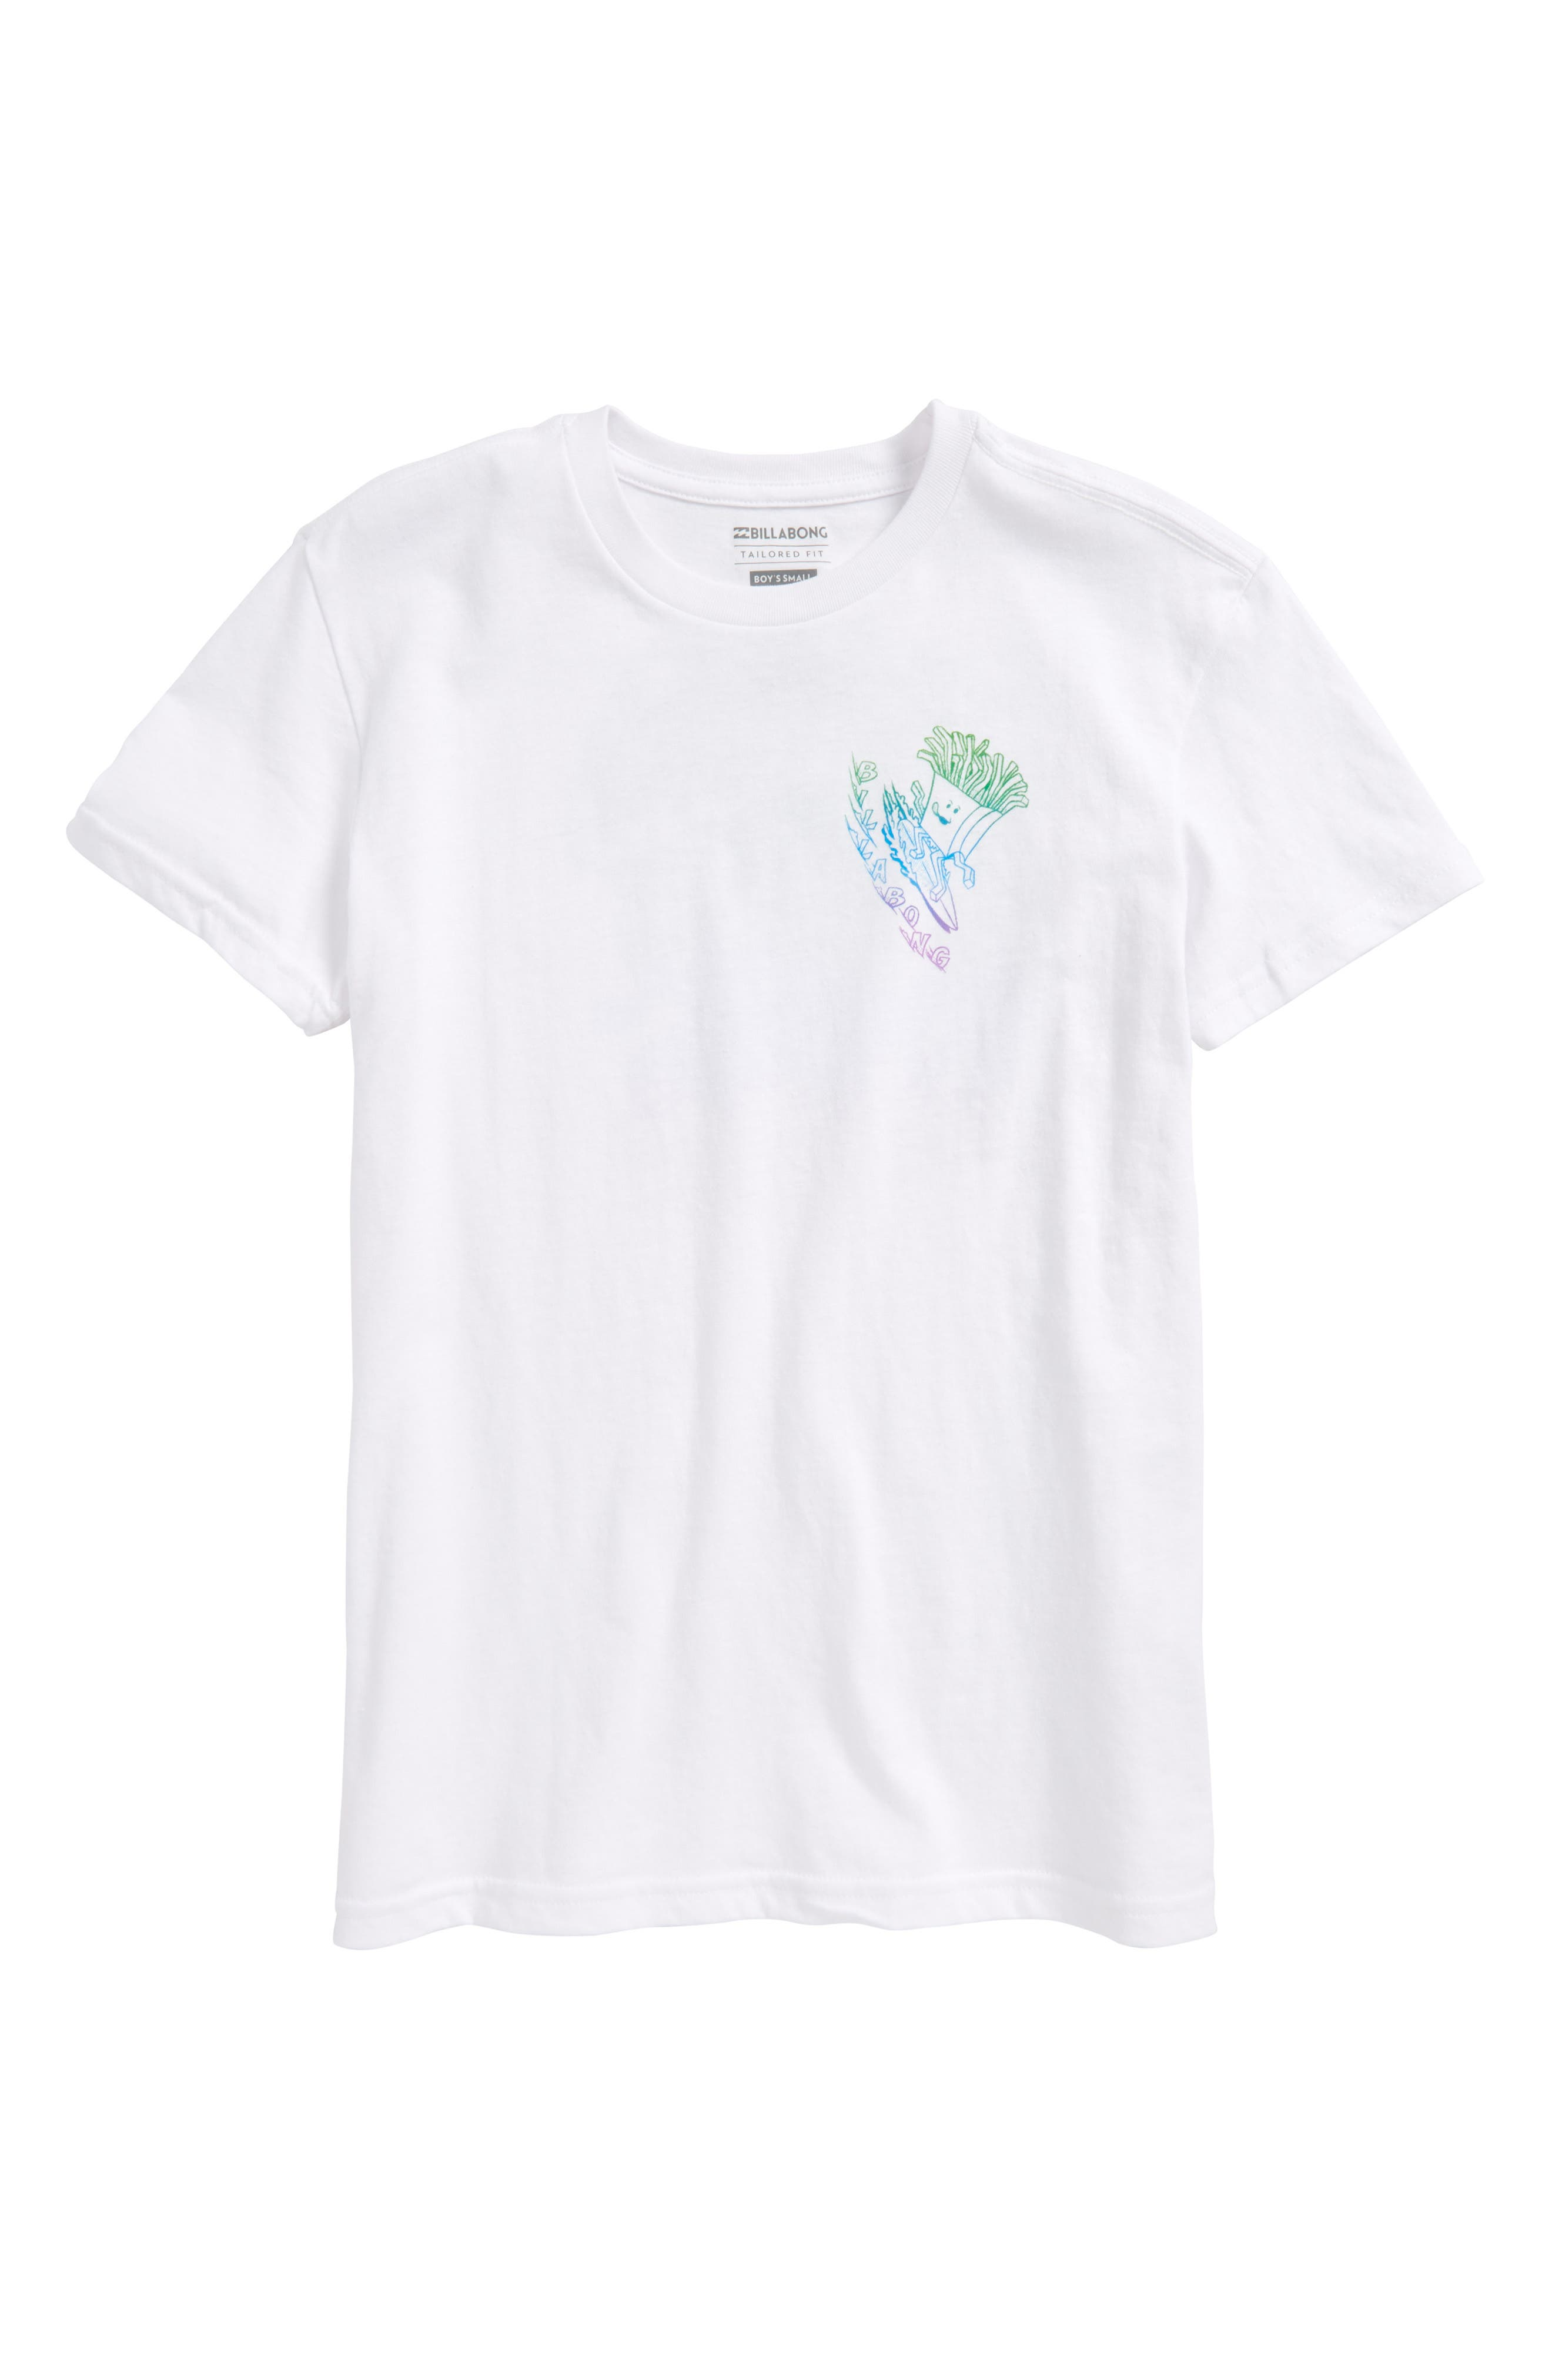 Snacks & Shacks Graphic T-Shirt,                         Main,                         color, 100